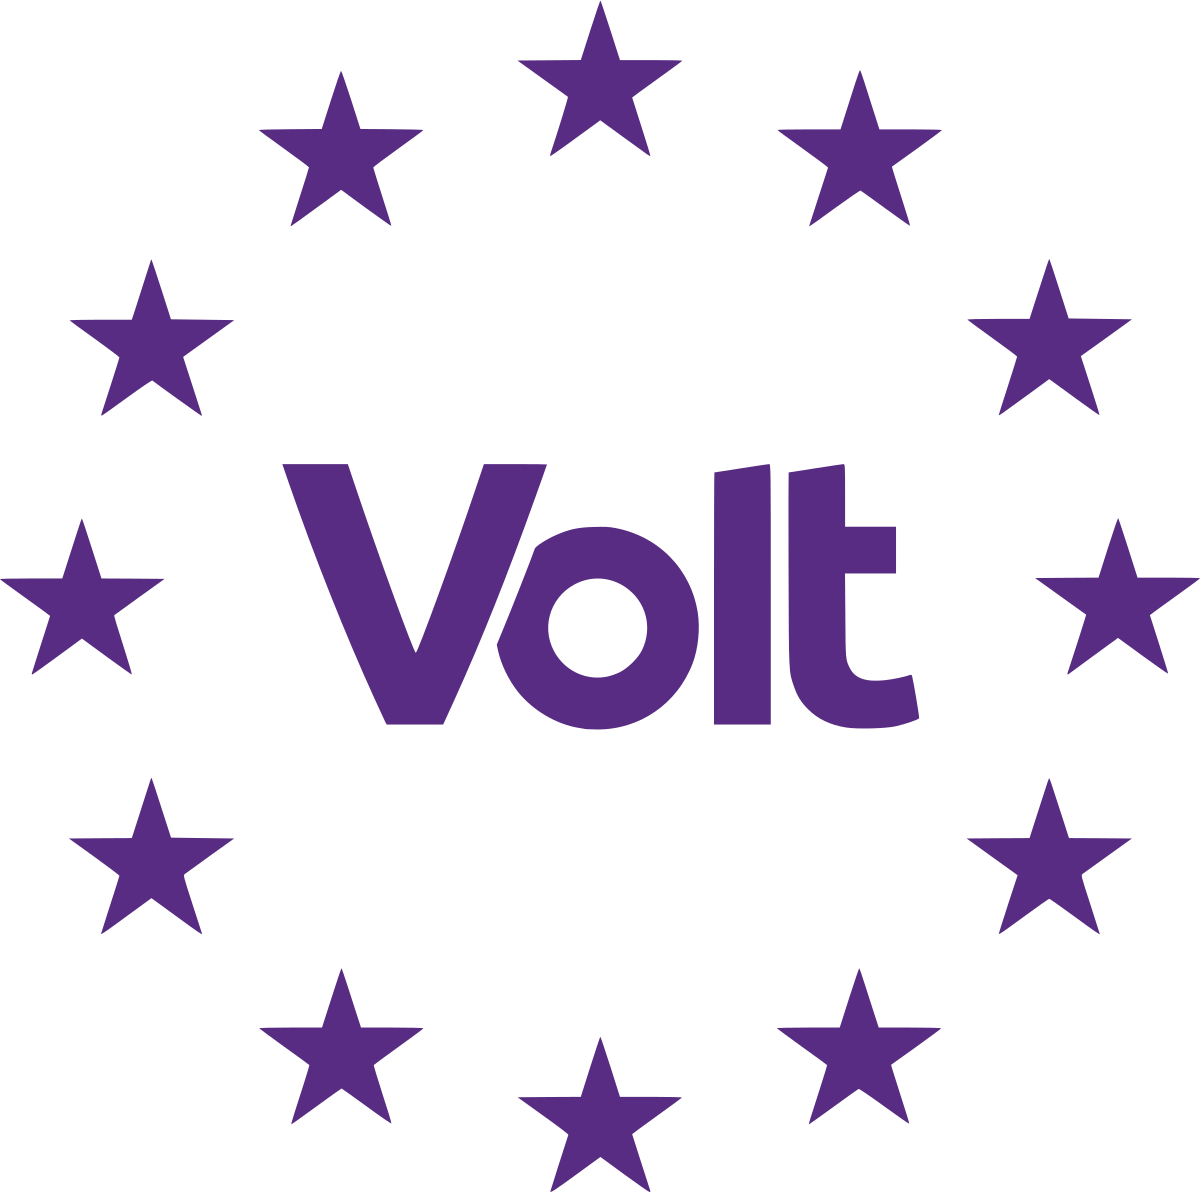 Volt-politiek-eindredacteur